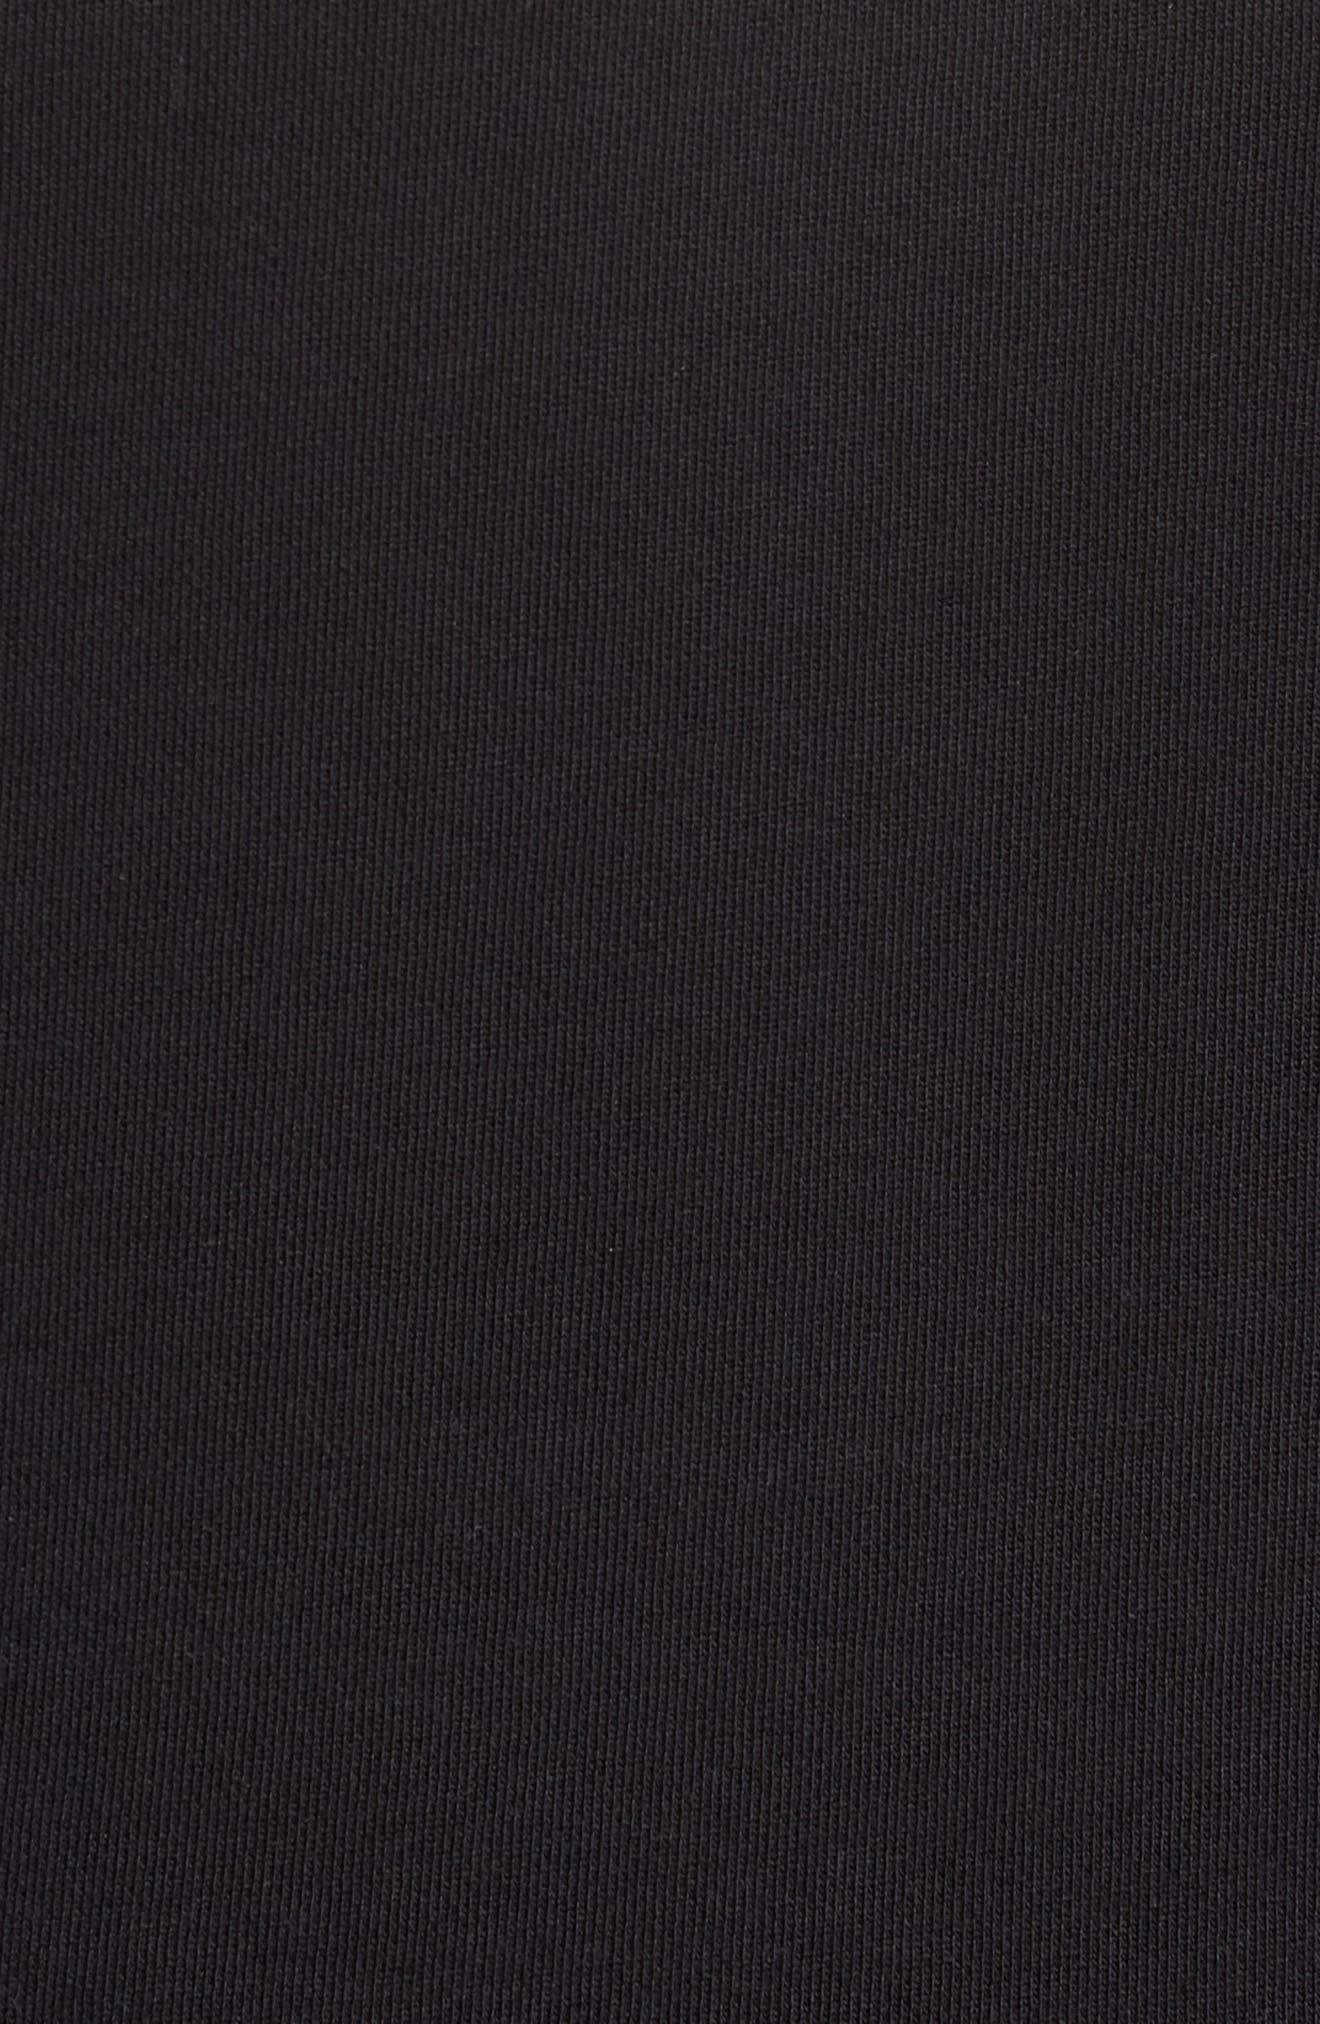 Colorblock Quarter Zip Pullover,                             Alternate thumbnail 5, color,                             TAWNY PORT